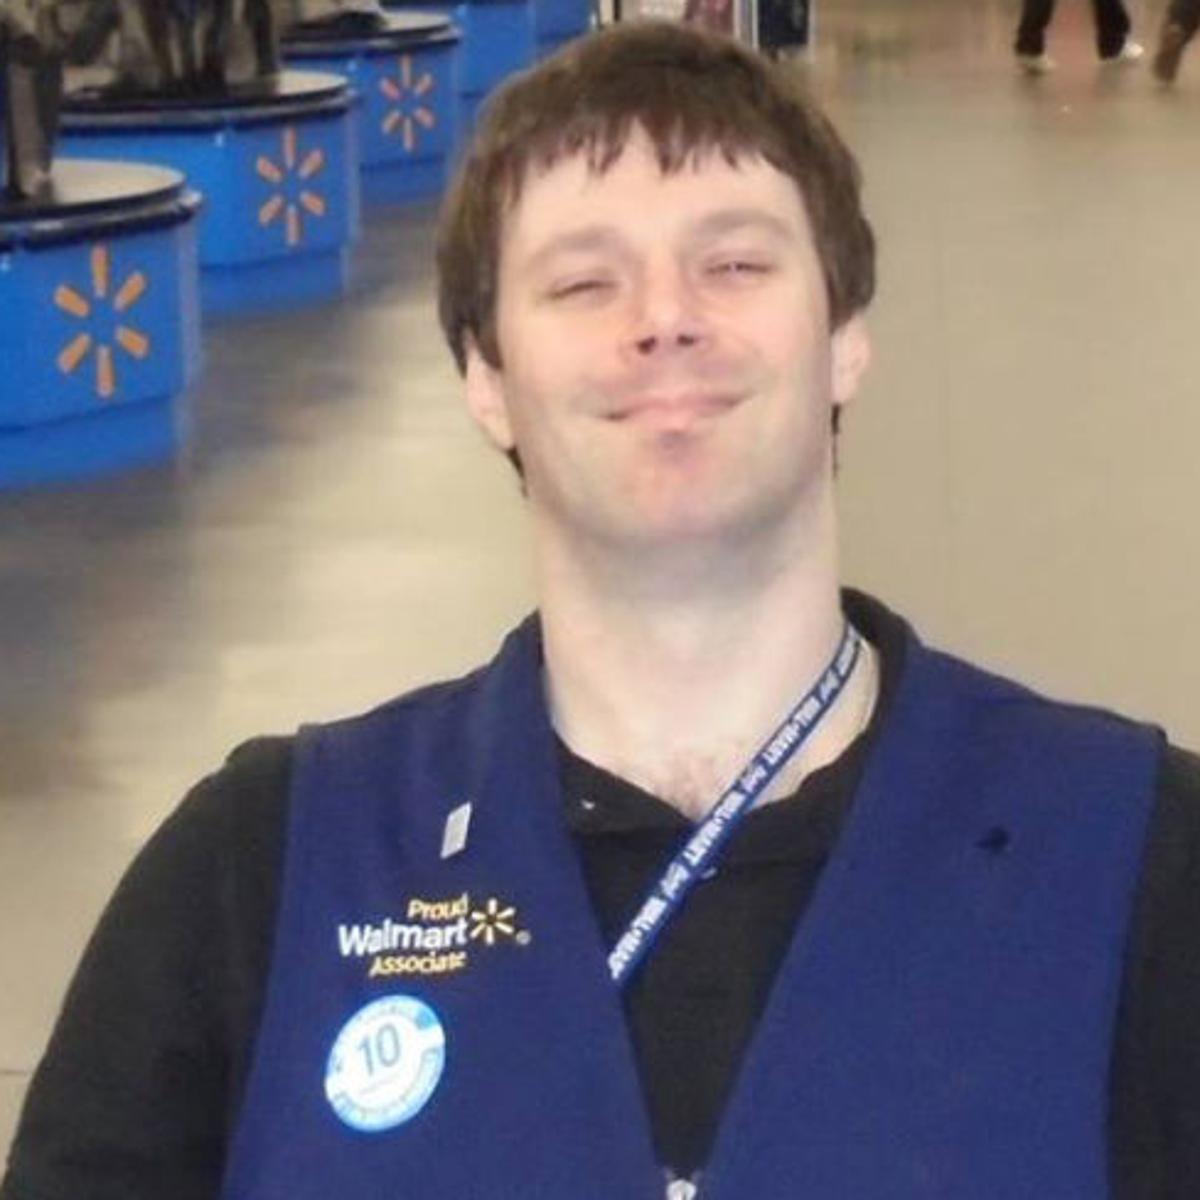 Disabled Walmart greeter may lose job due to new